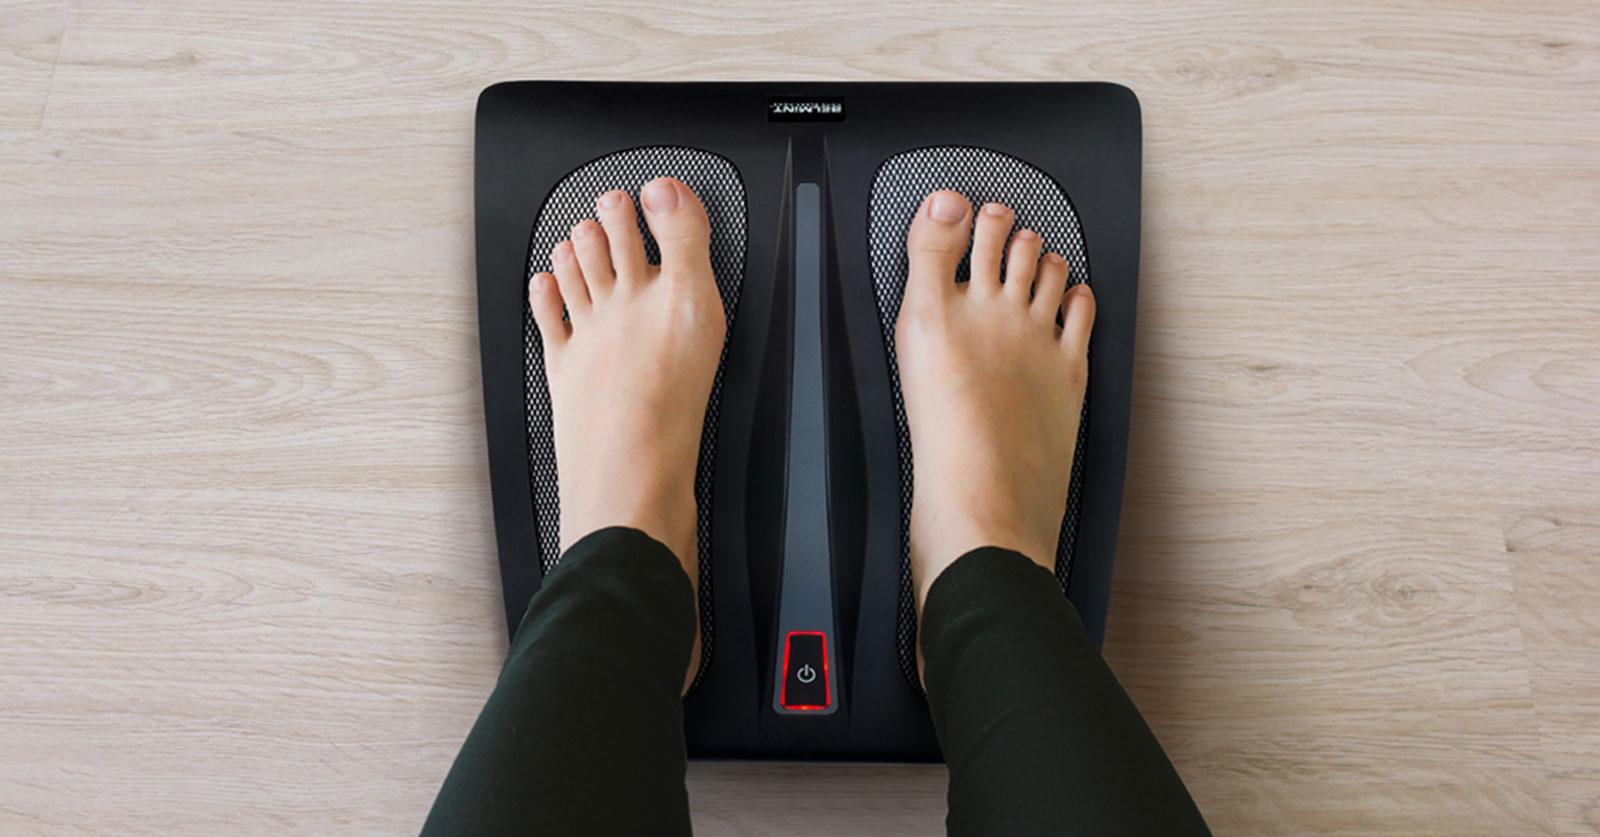 Belmint Shiatsu Foot Massager w/ Built-In Heat Function - Deep Kneading Therapy 2